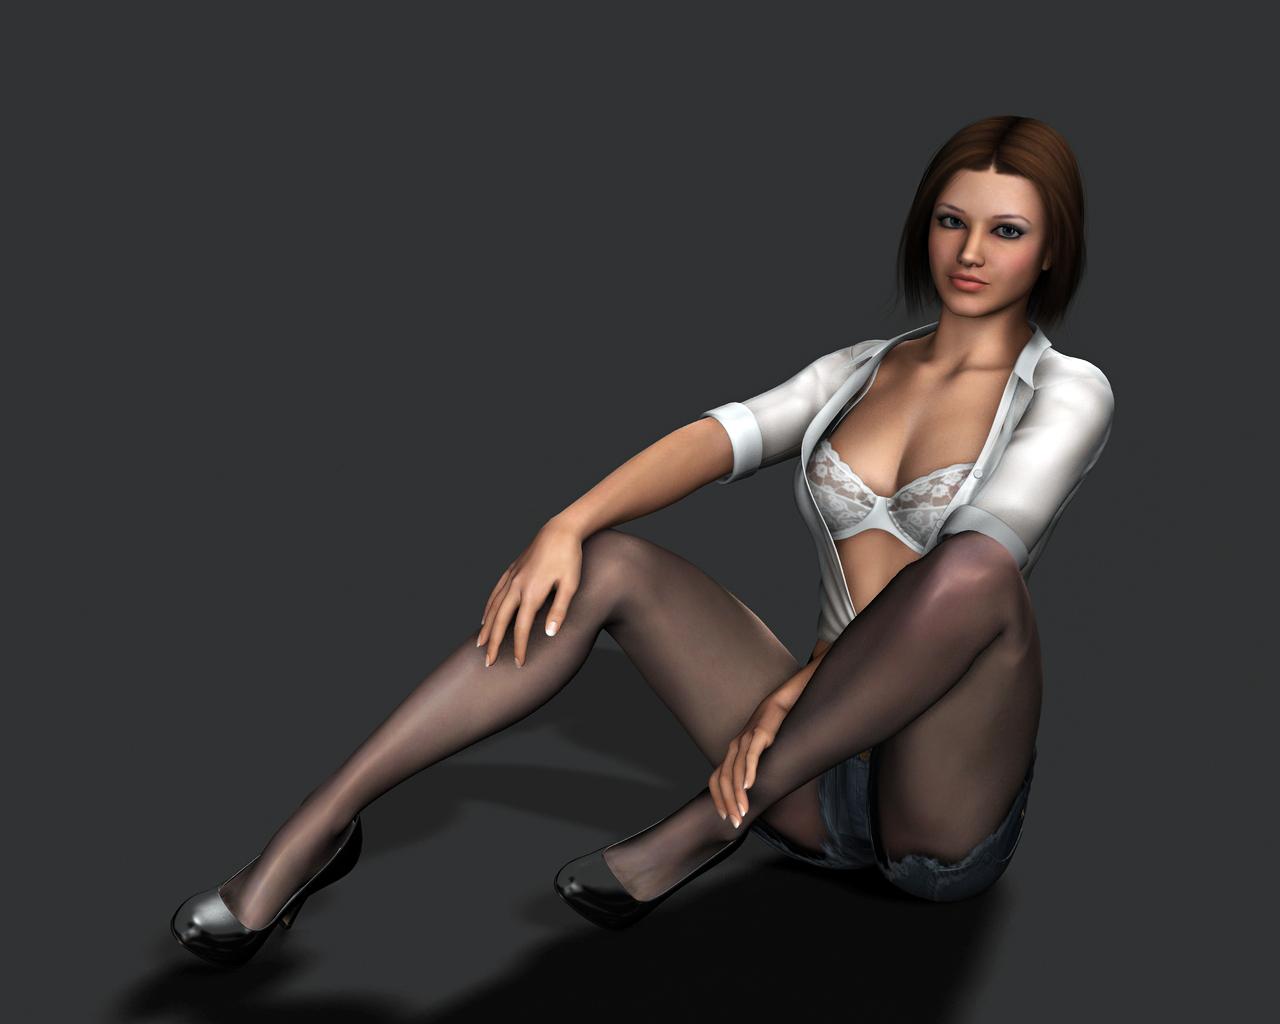 Amanda Jones Nude download sex pics amanda jones pinup 1torqual3d on